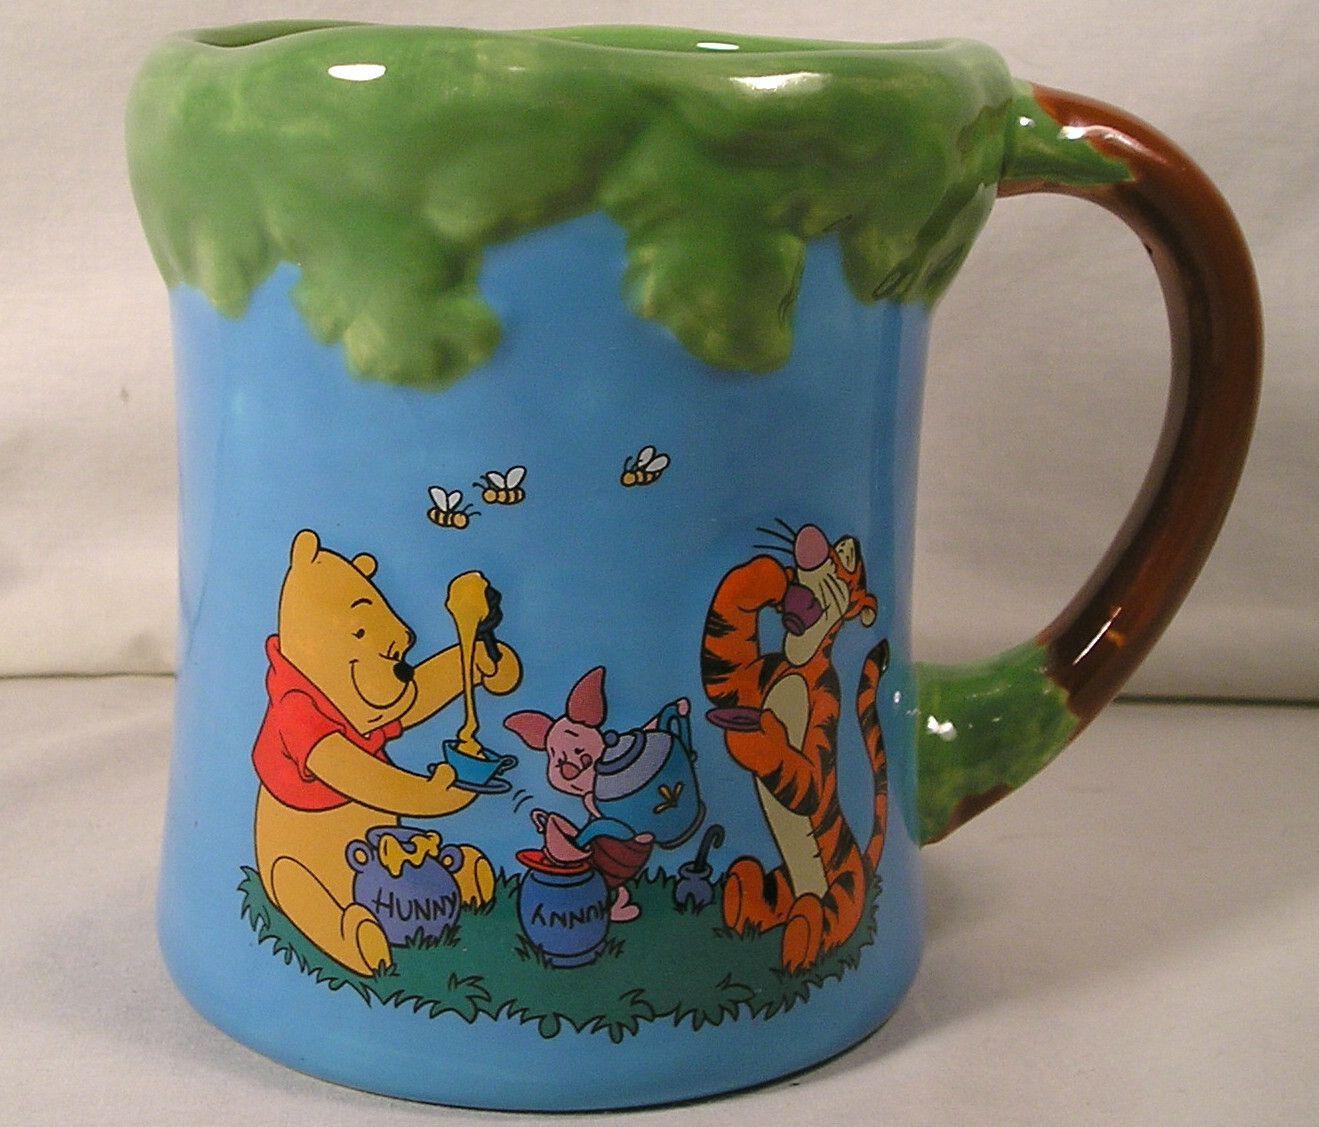 Winnie The Pooh,Tigger,Piglet Coffee Mug,Disney Mug Picnic Fun w/Pooh+Friends | eBay